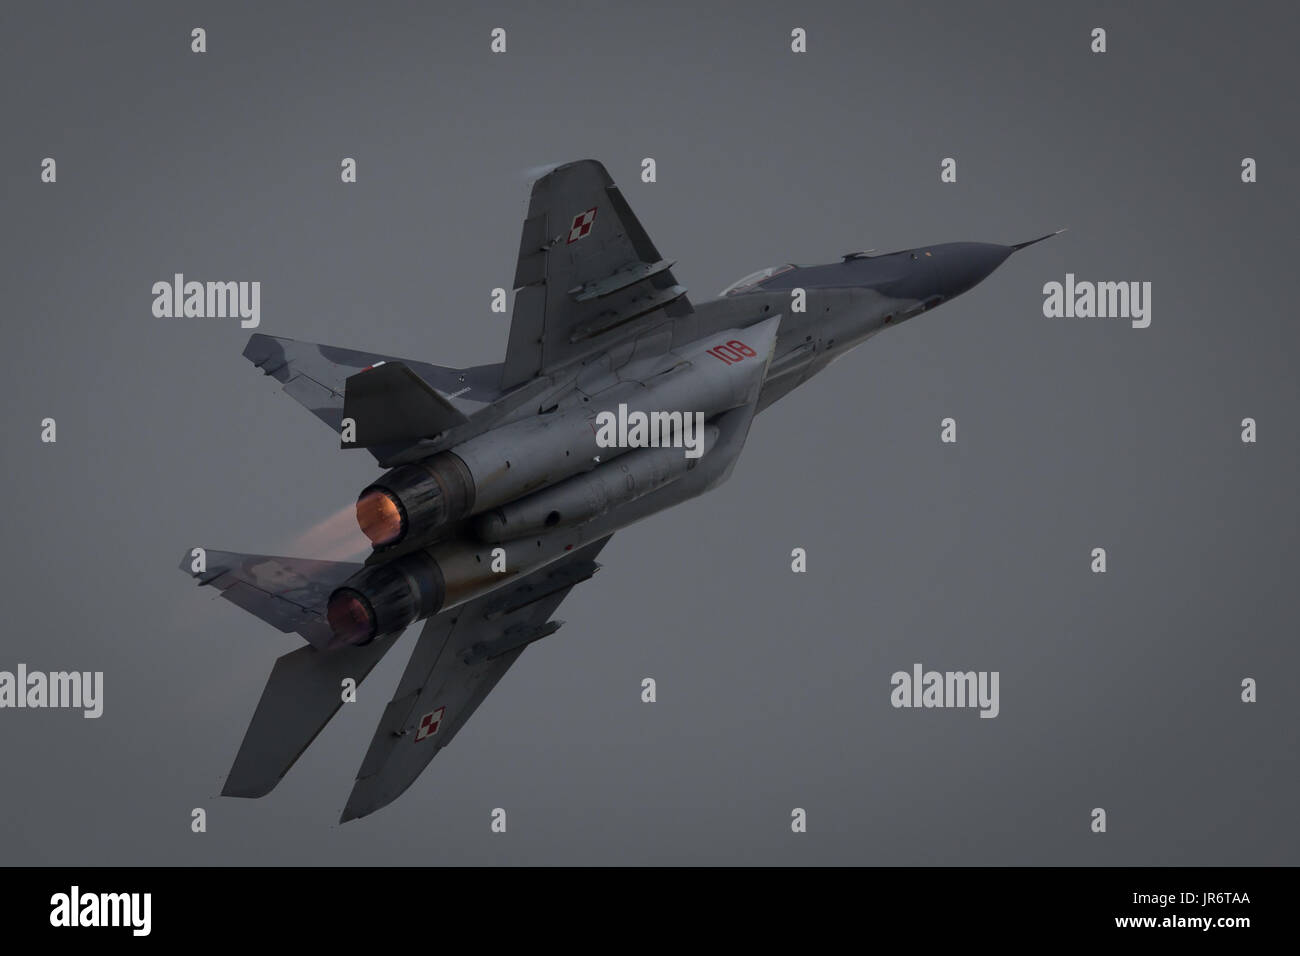 Fairford, Gloucestershire, UK - July 10th, 2016: Ex-Russian Soviet Cold War Polish Republic Mikoyan MiG-29 Fulcrum Stock Photo